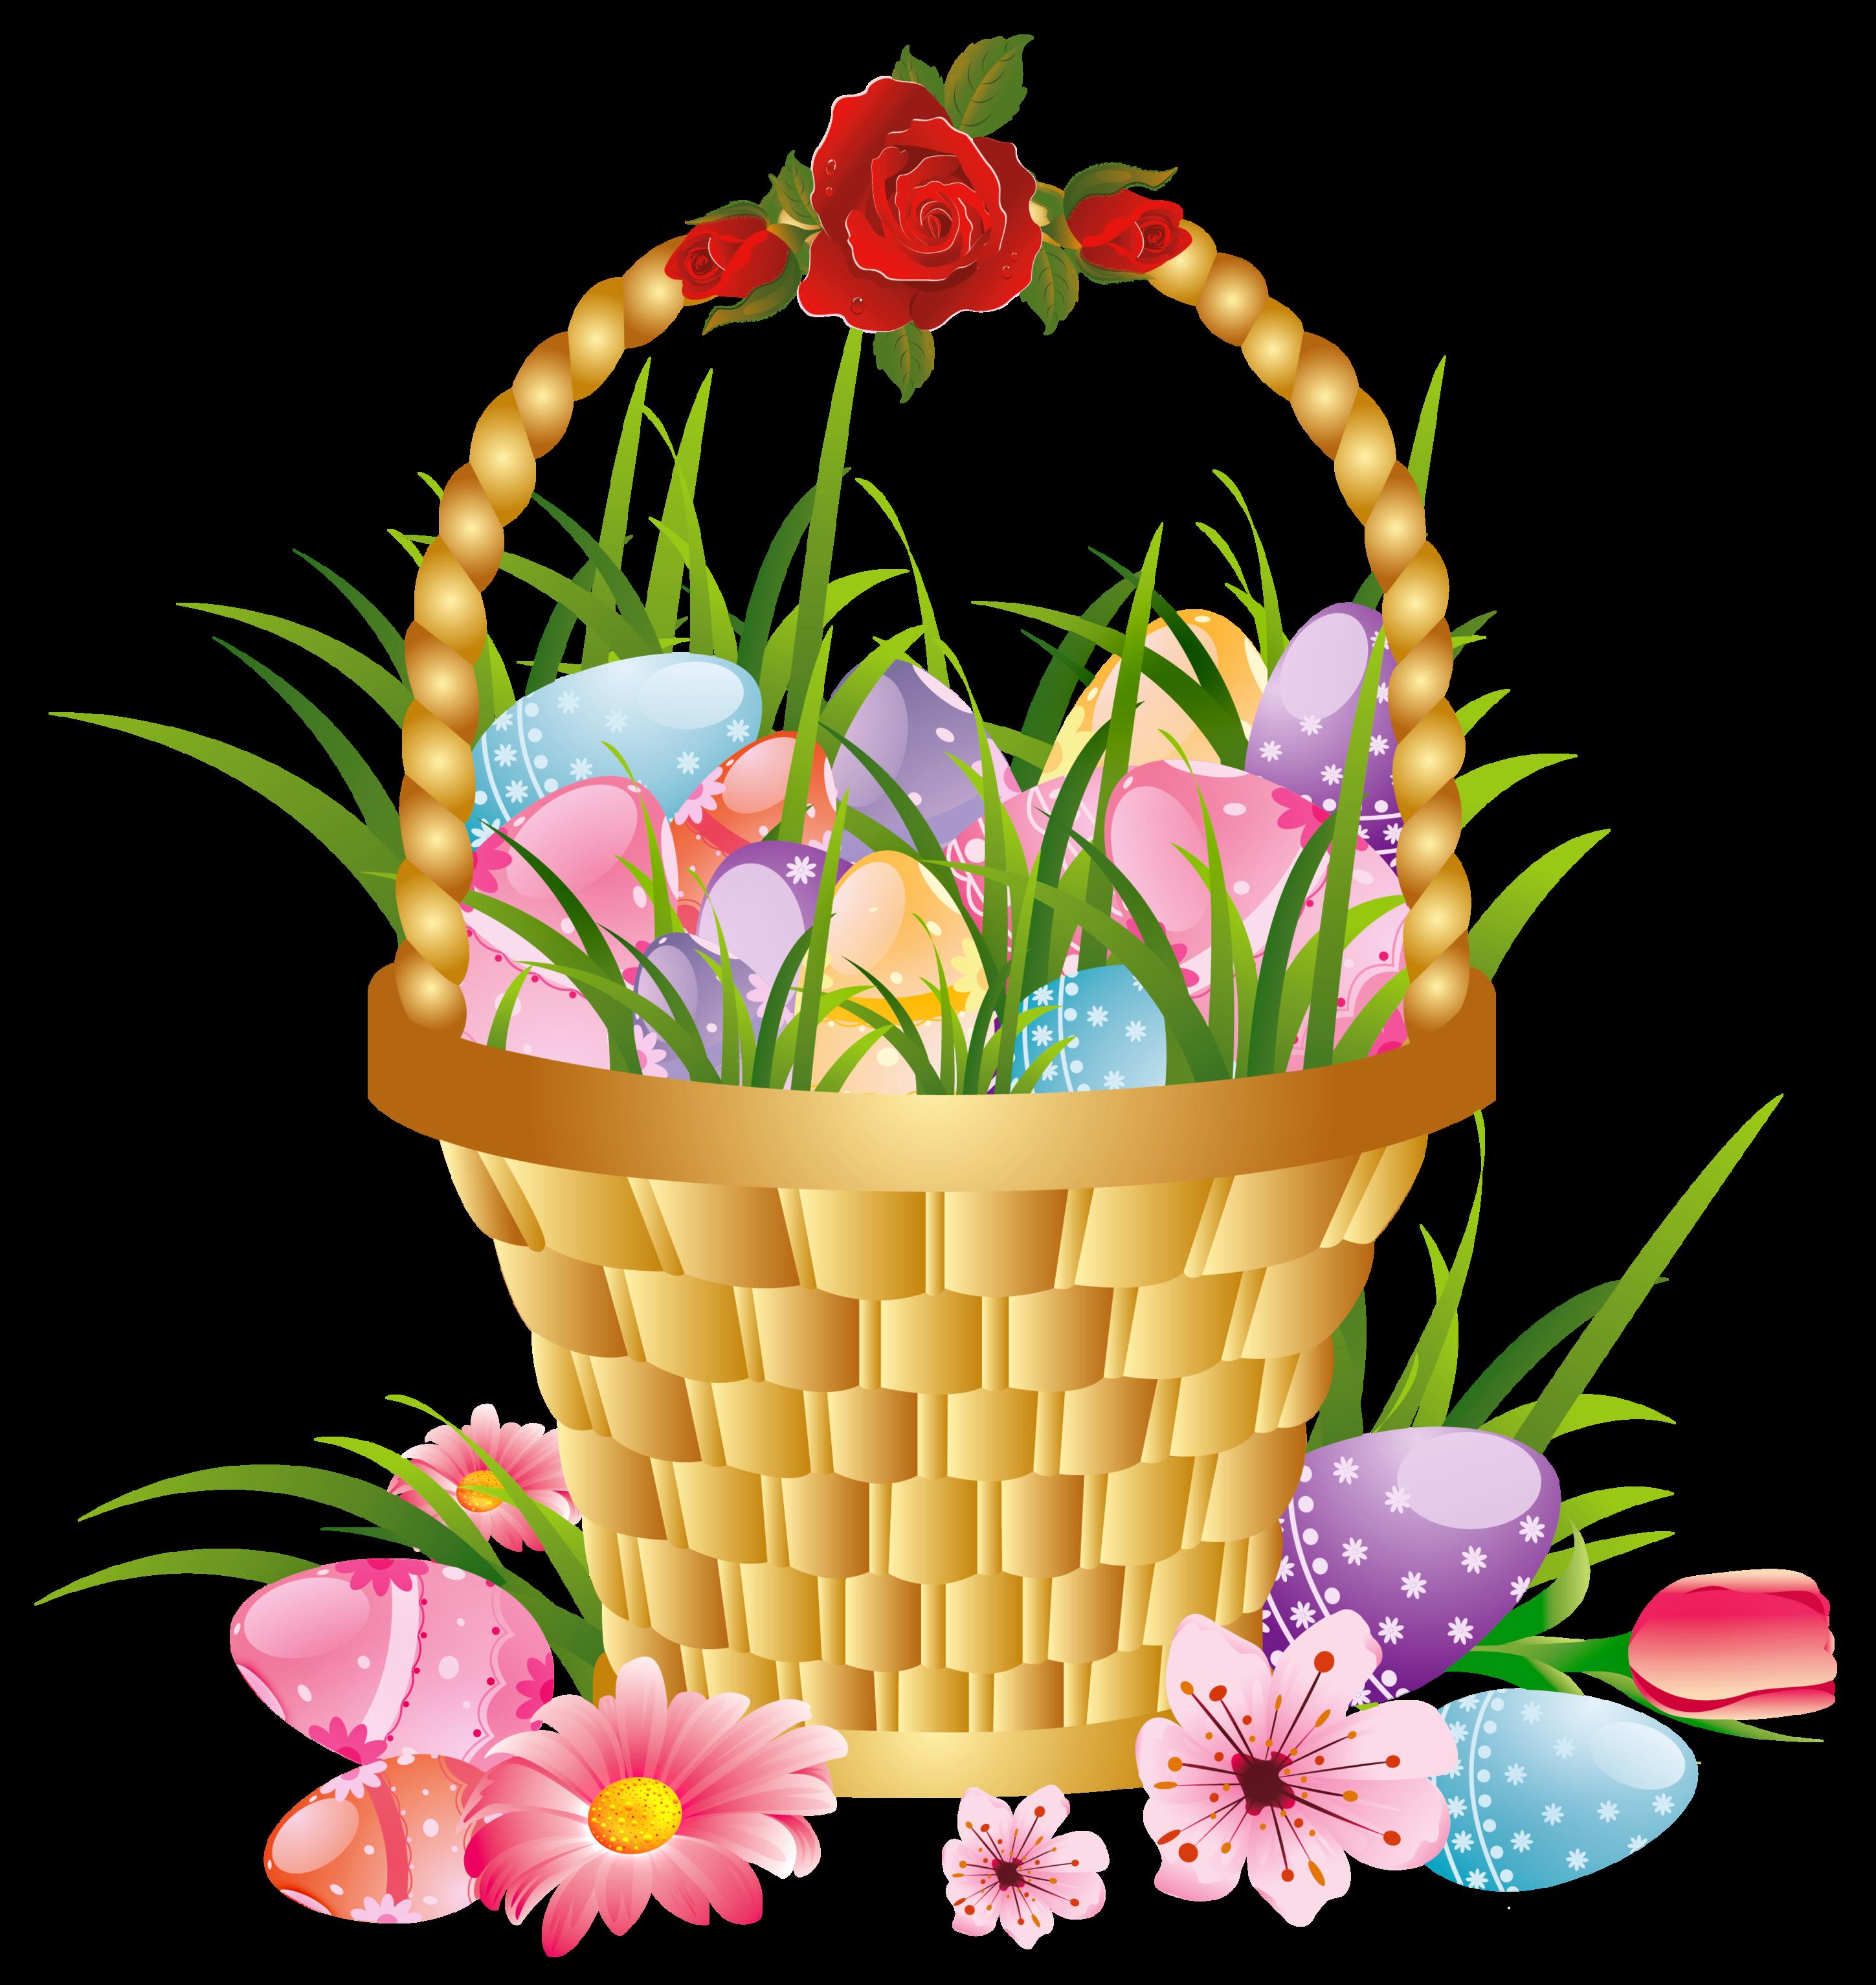 Clipart Flower Baskets : Basket of flowers clip art clipart best